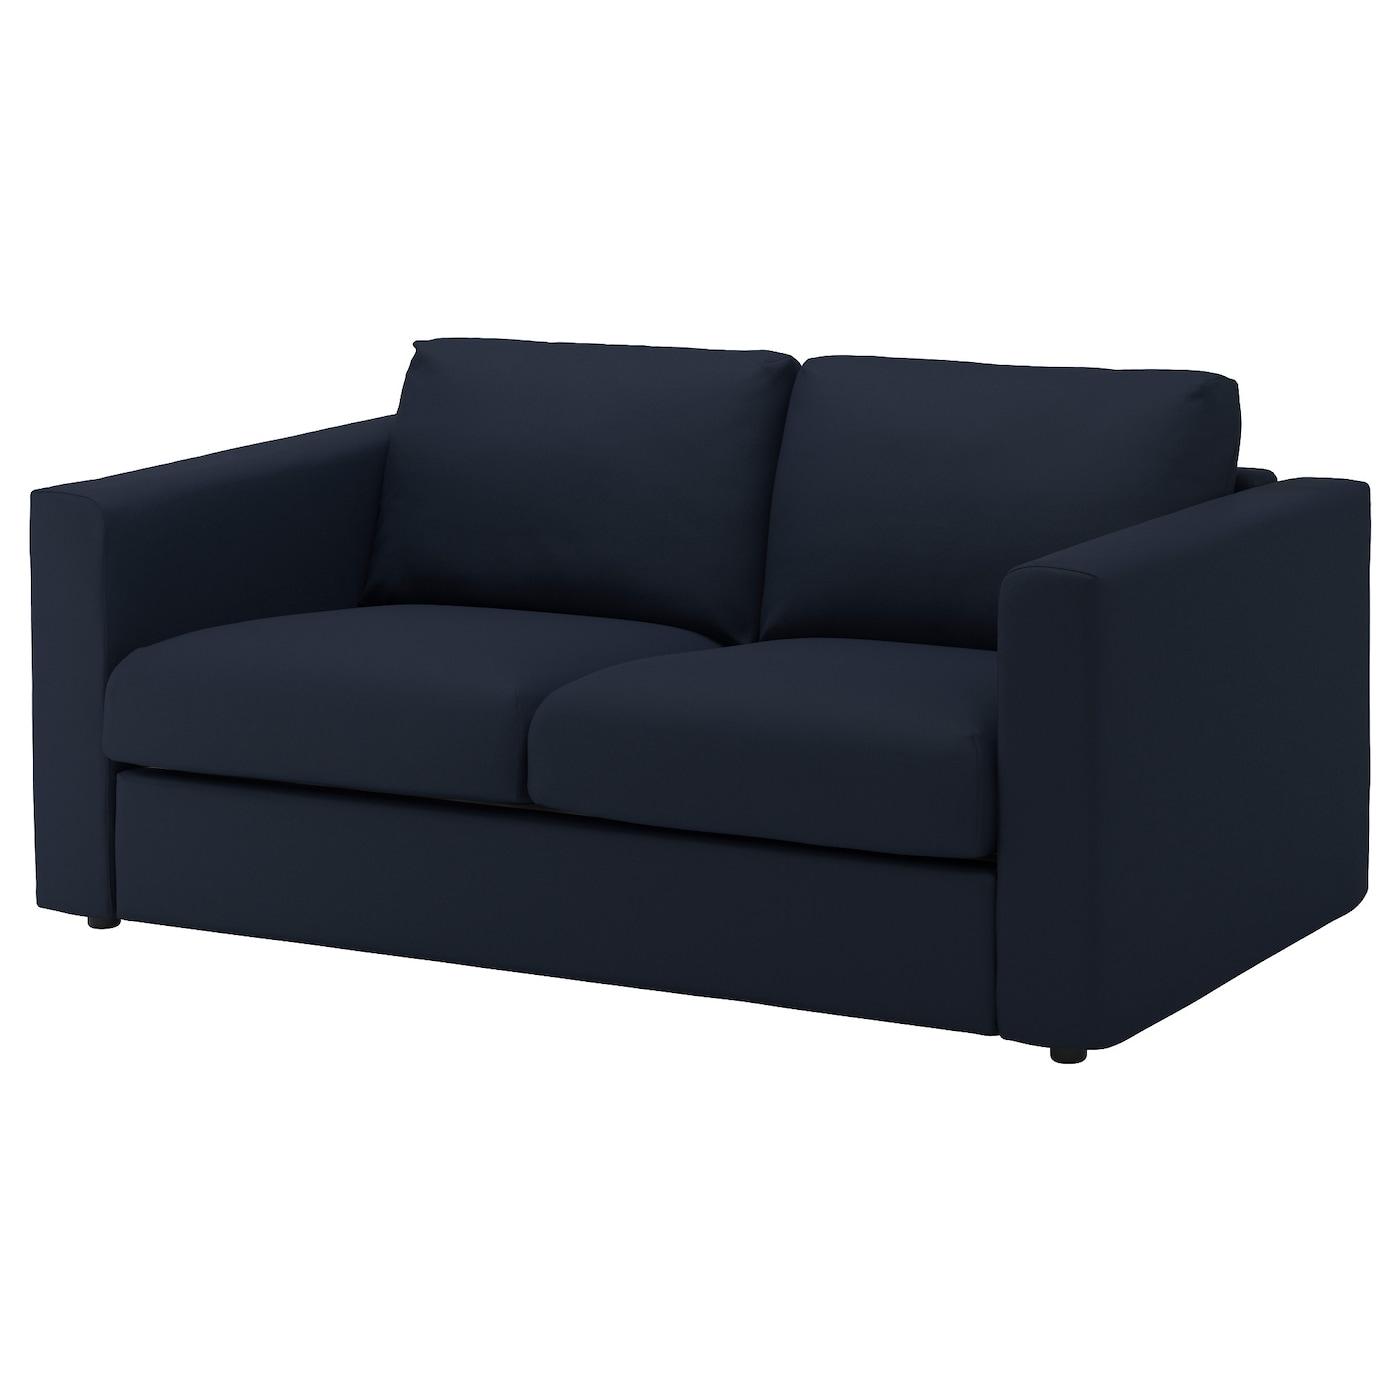 VIMLE 2 seat sofa Gräsbo black blue IKEA